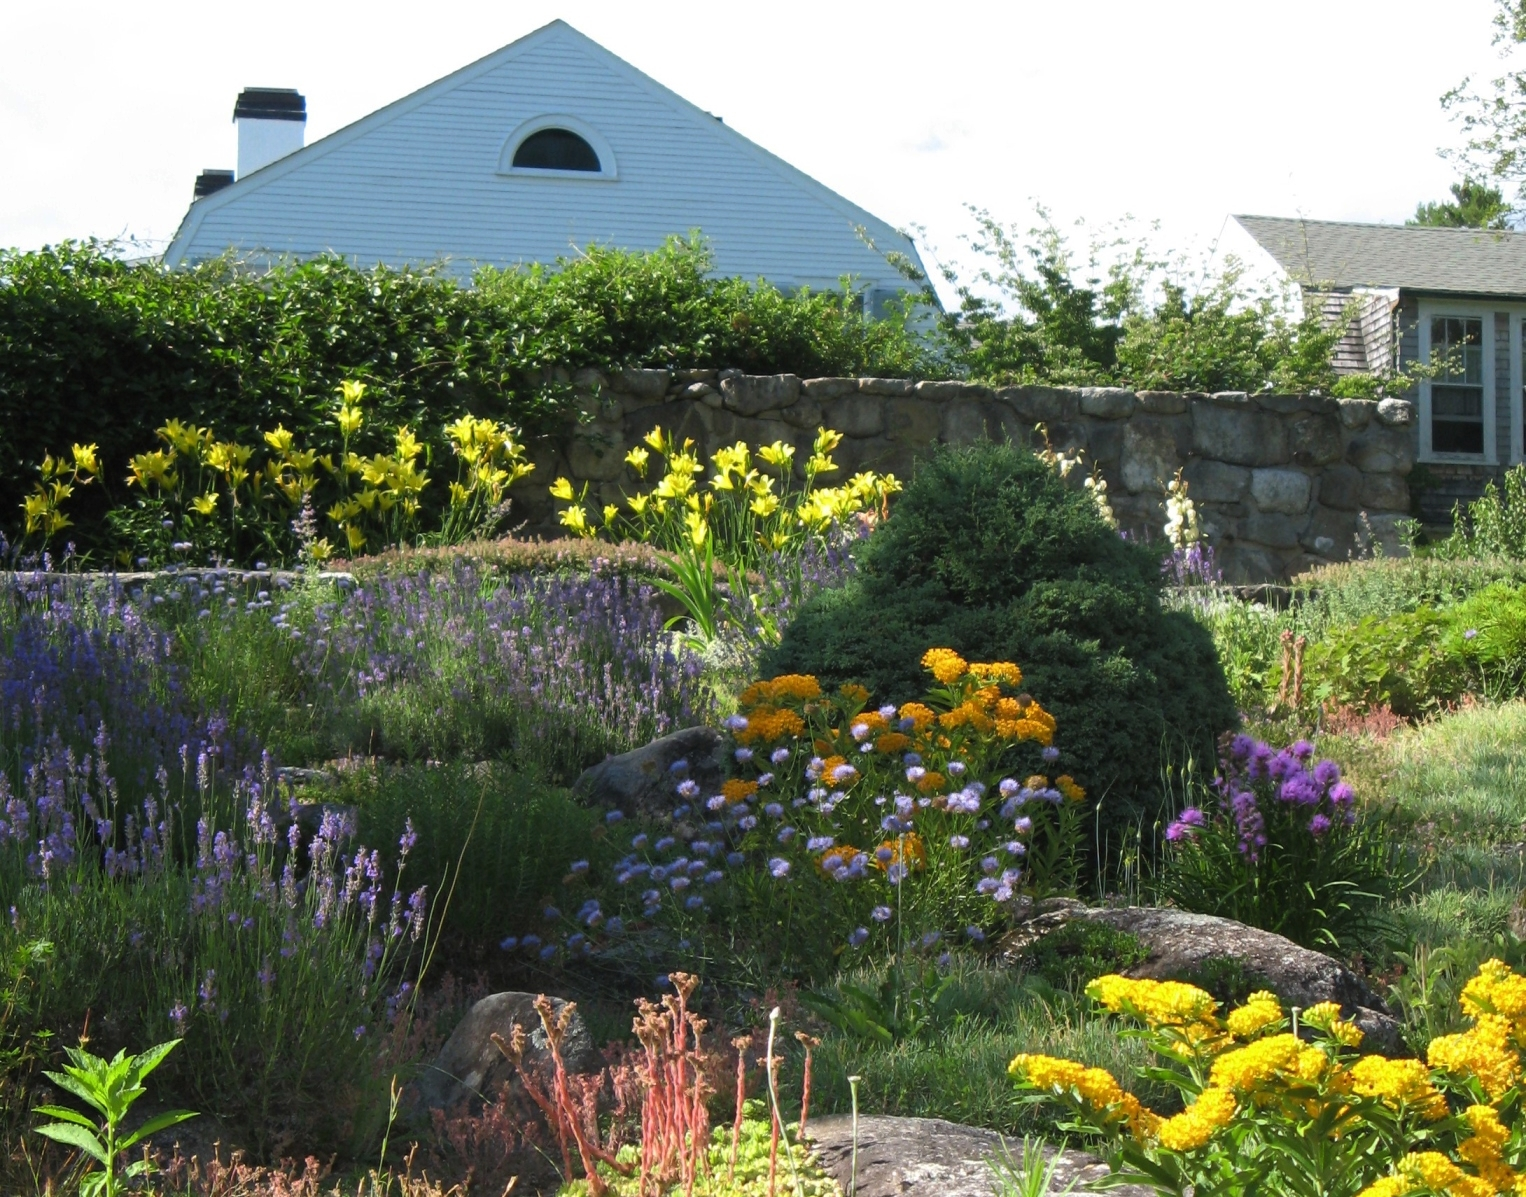 The summer Rock Garden in full bloom.